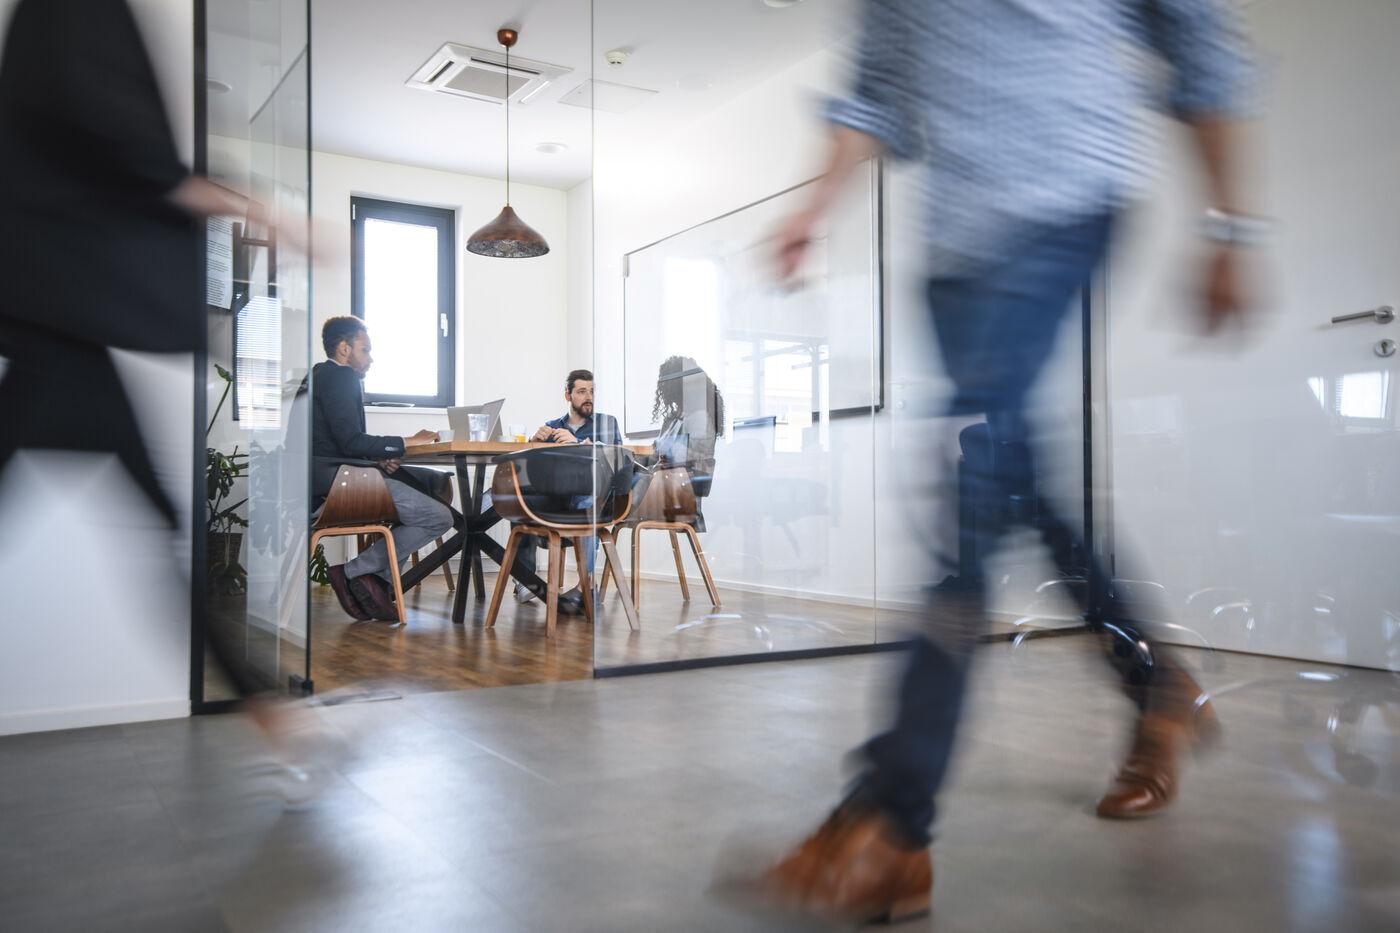 IT Projektassistent (m/w/d) - Job Heidelberg, Homeoffice - Jobs bei Discovergy